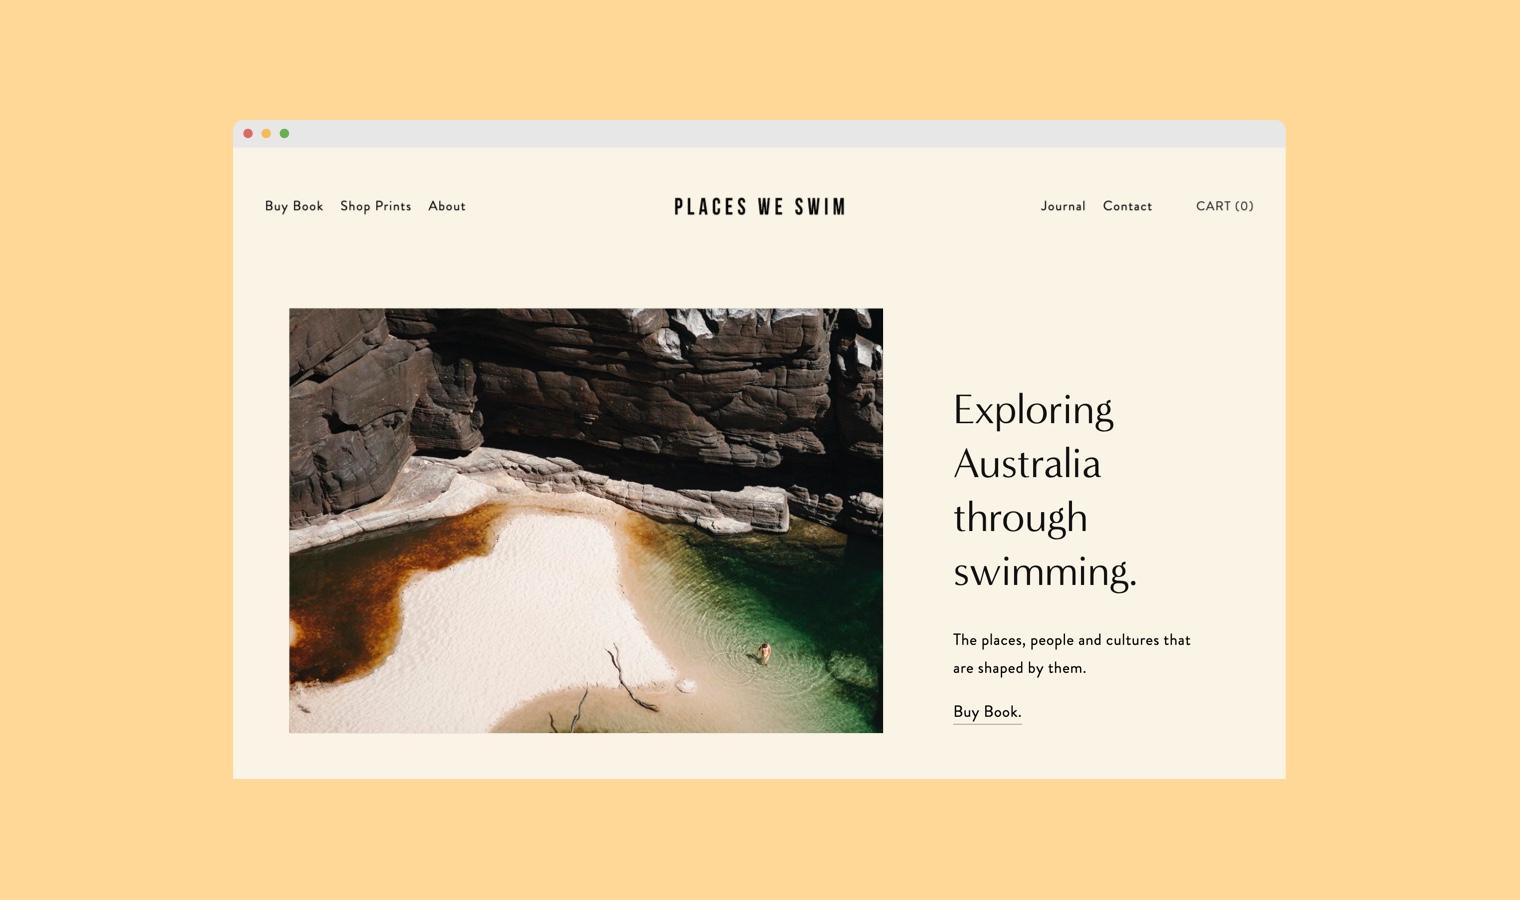 adventure-ethical-web-design-agency-sustainable-brands-graphic-designer-sydney-byron-bay-bondi-melbourne-branding.jpg